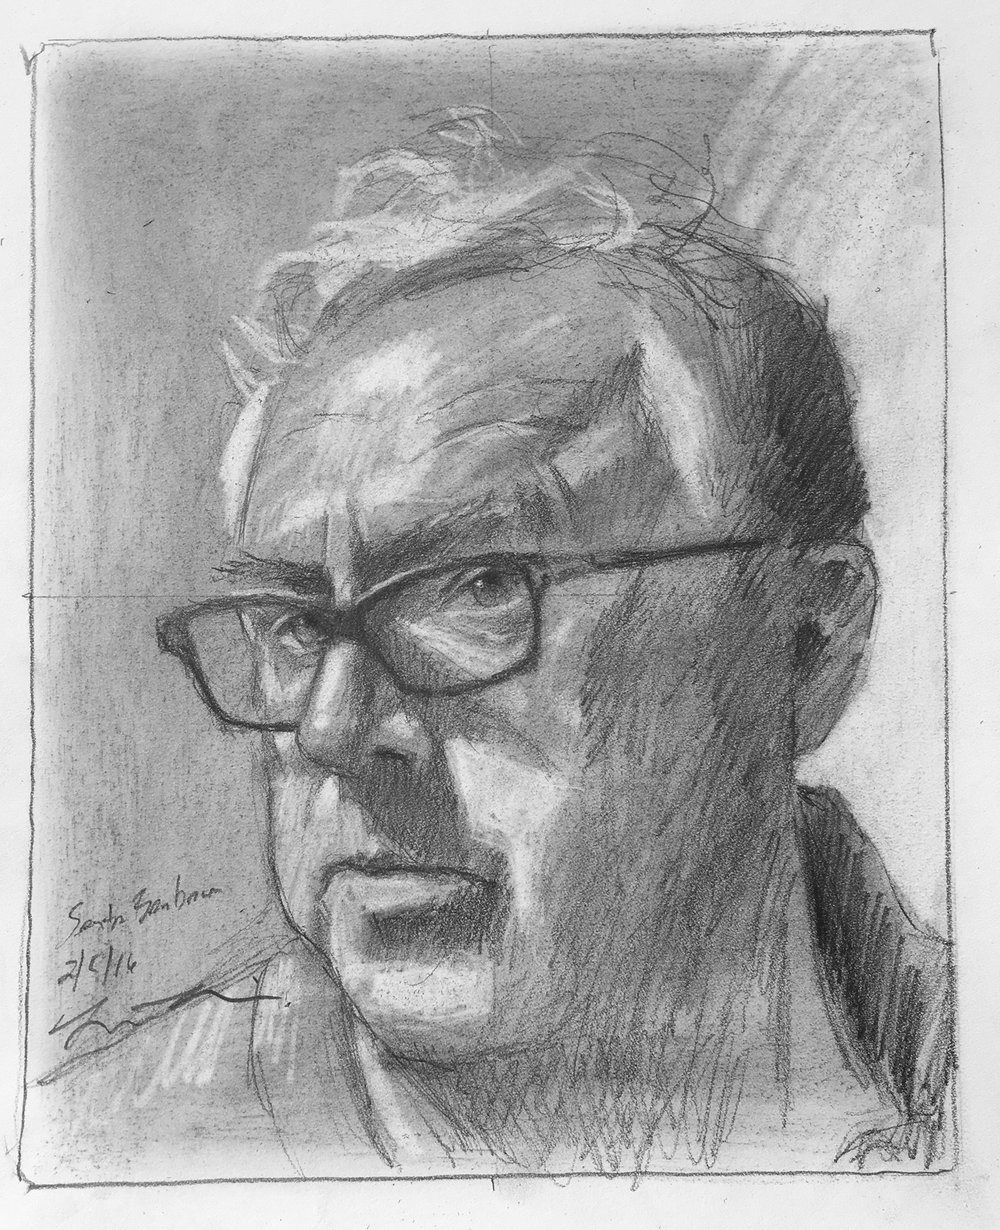 Brian Bomeisler (demonstration self-portrait) 2-1-2016